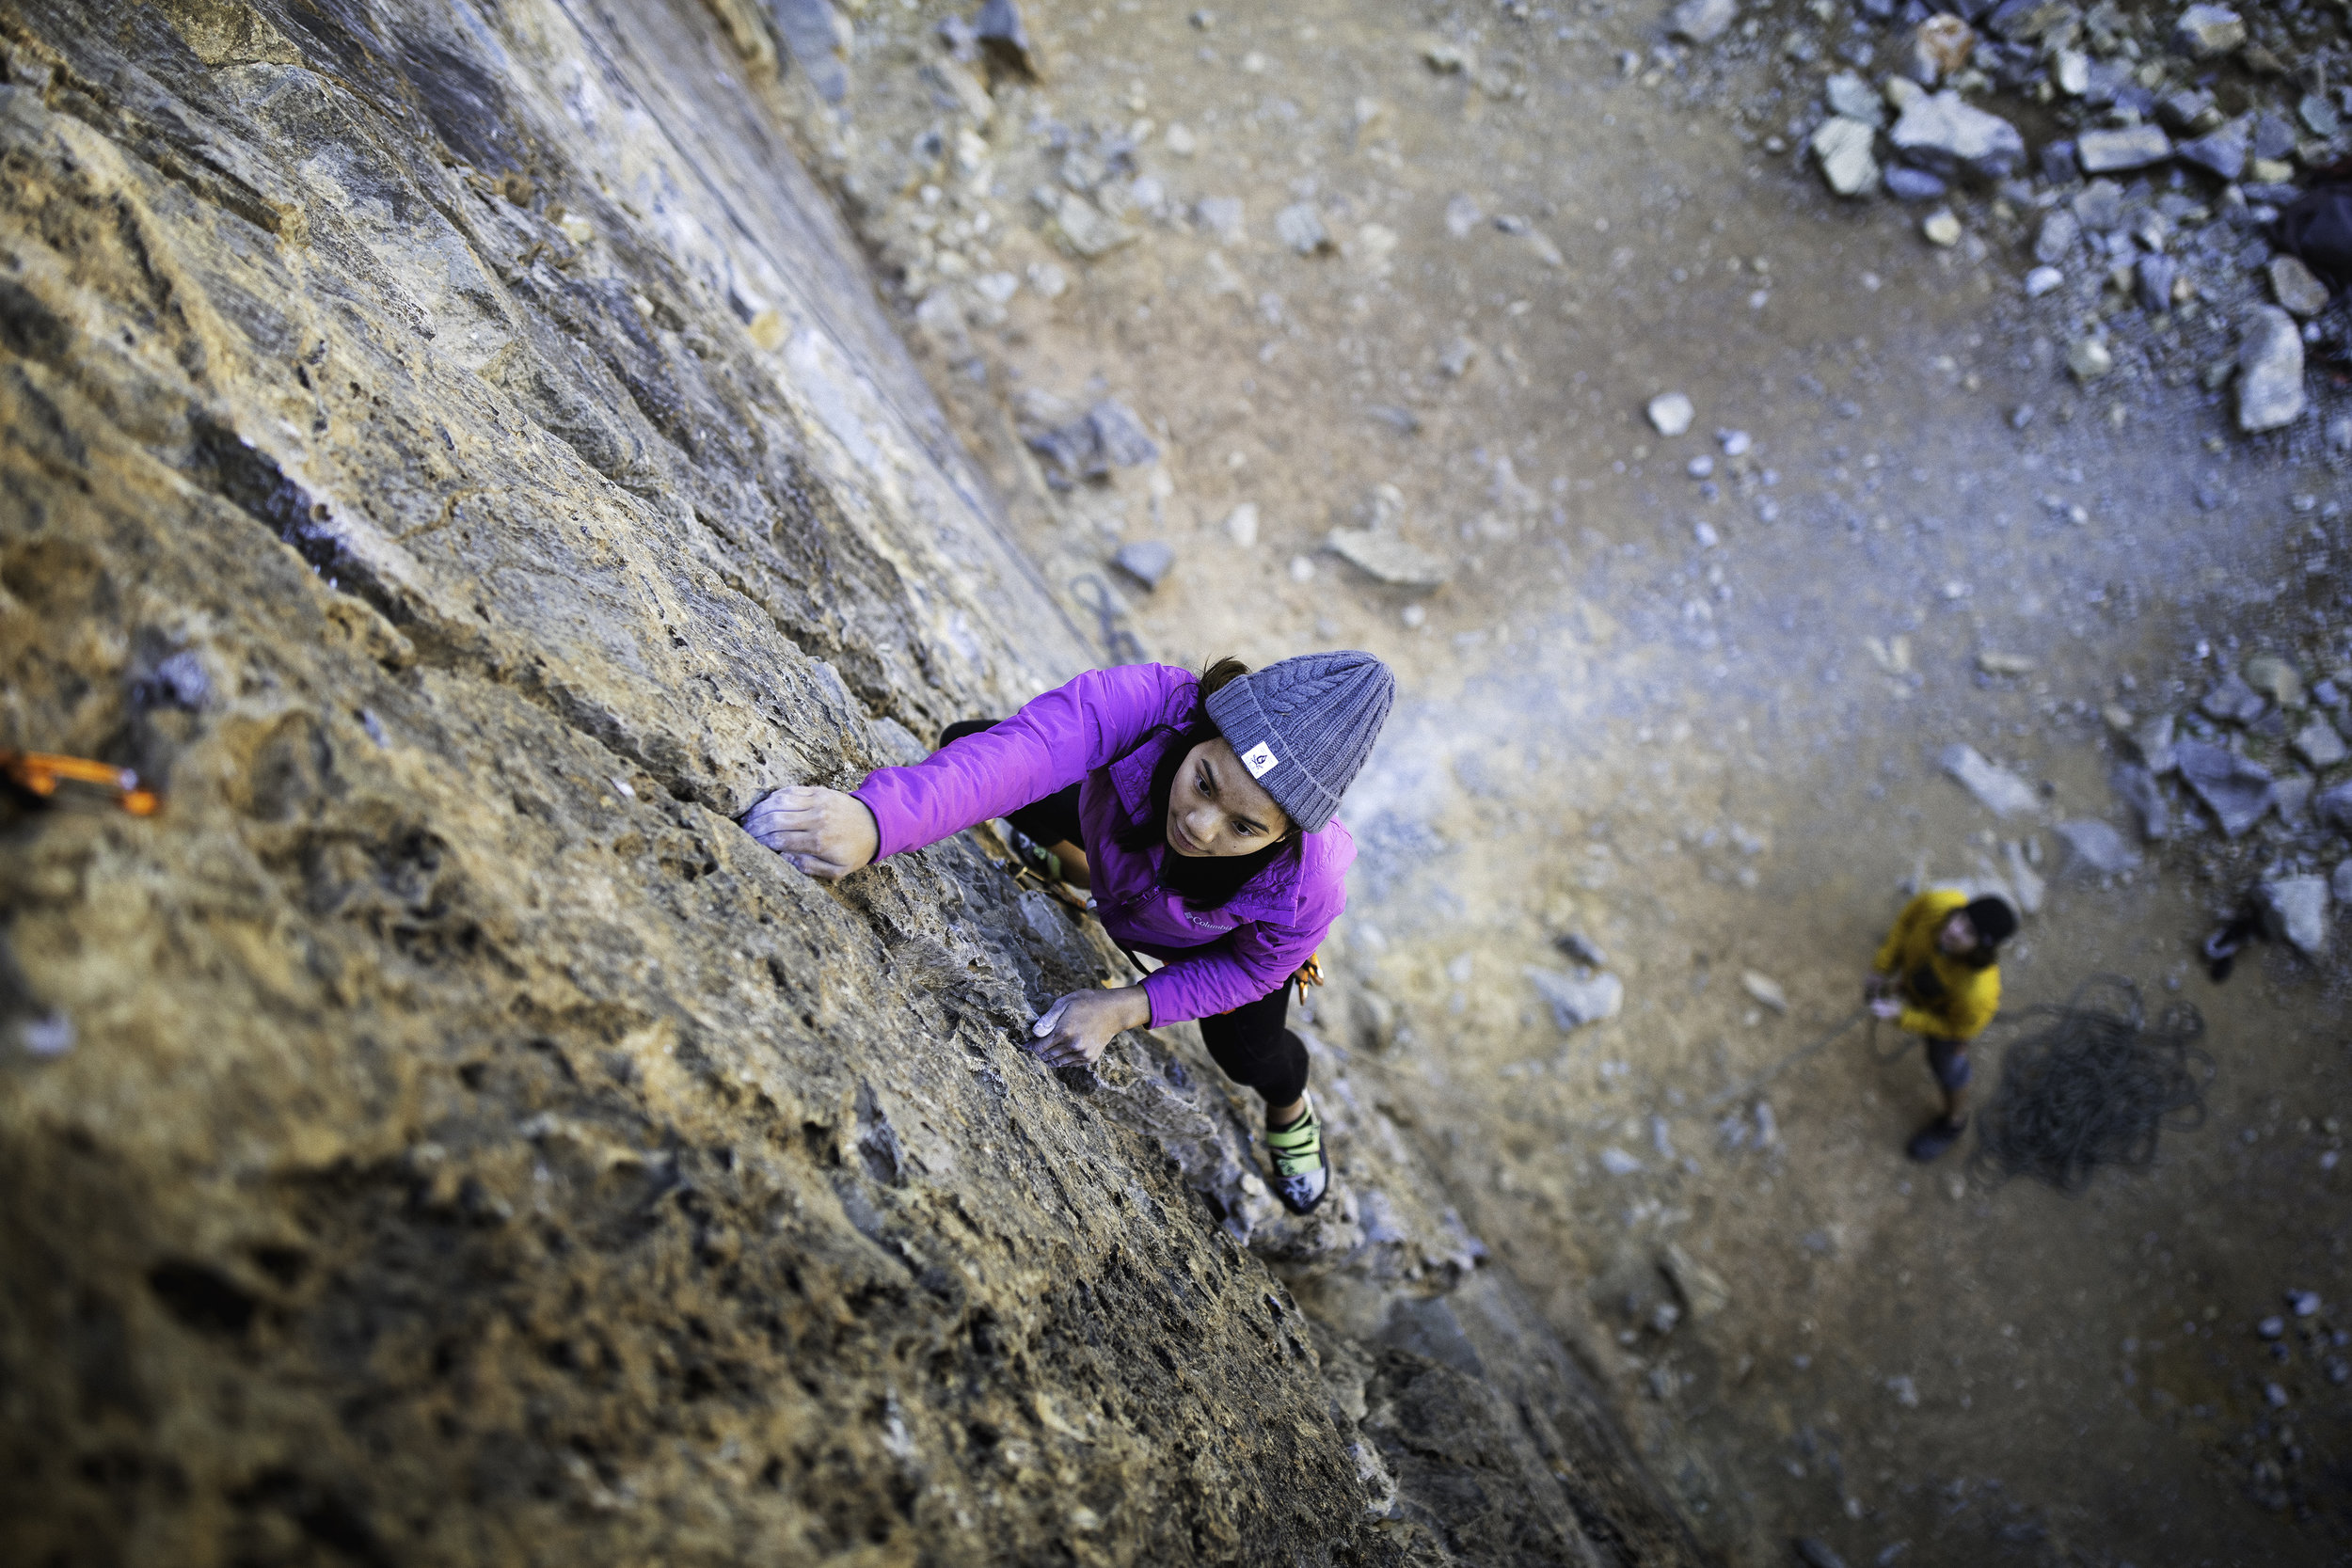 ON THE WALL - a climber's eyes